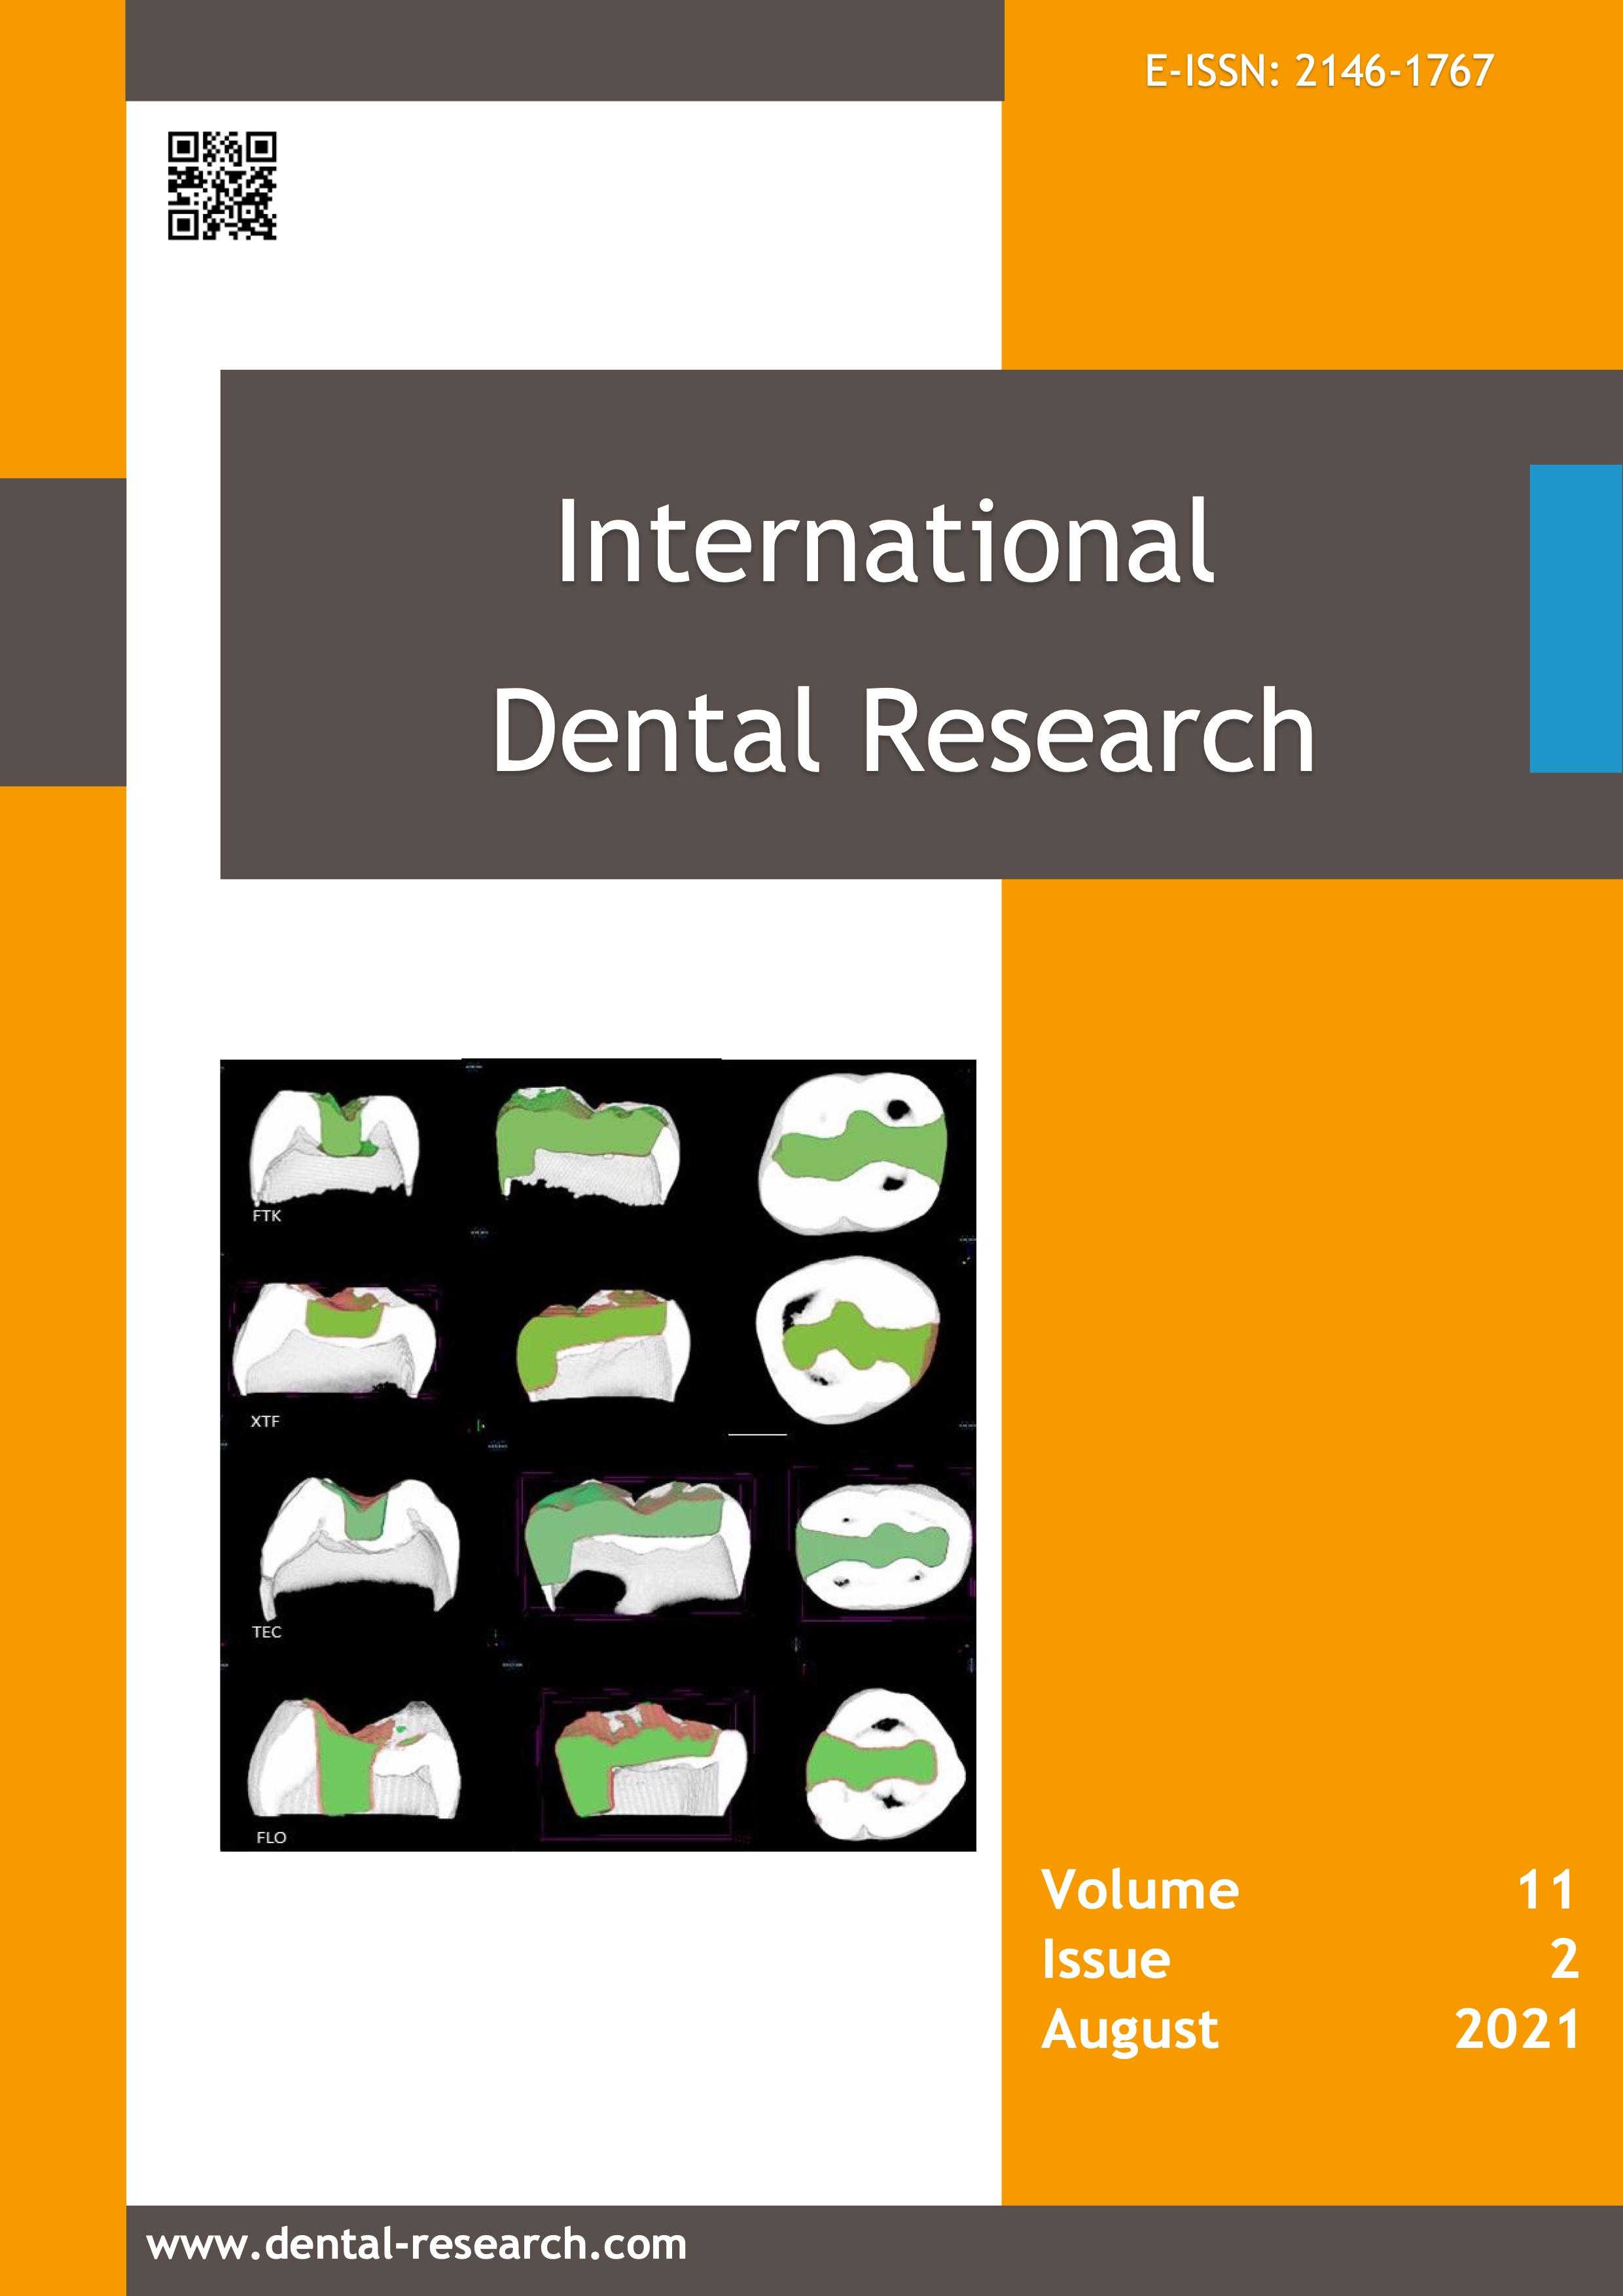 Vol 11 No 2 (2021): International Dental Research